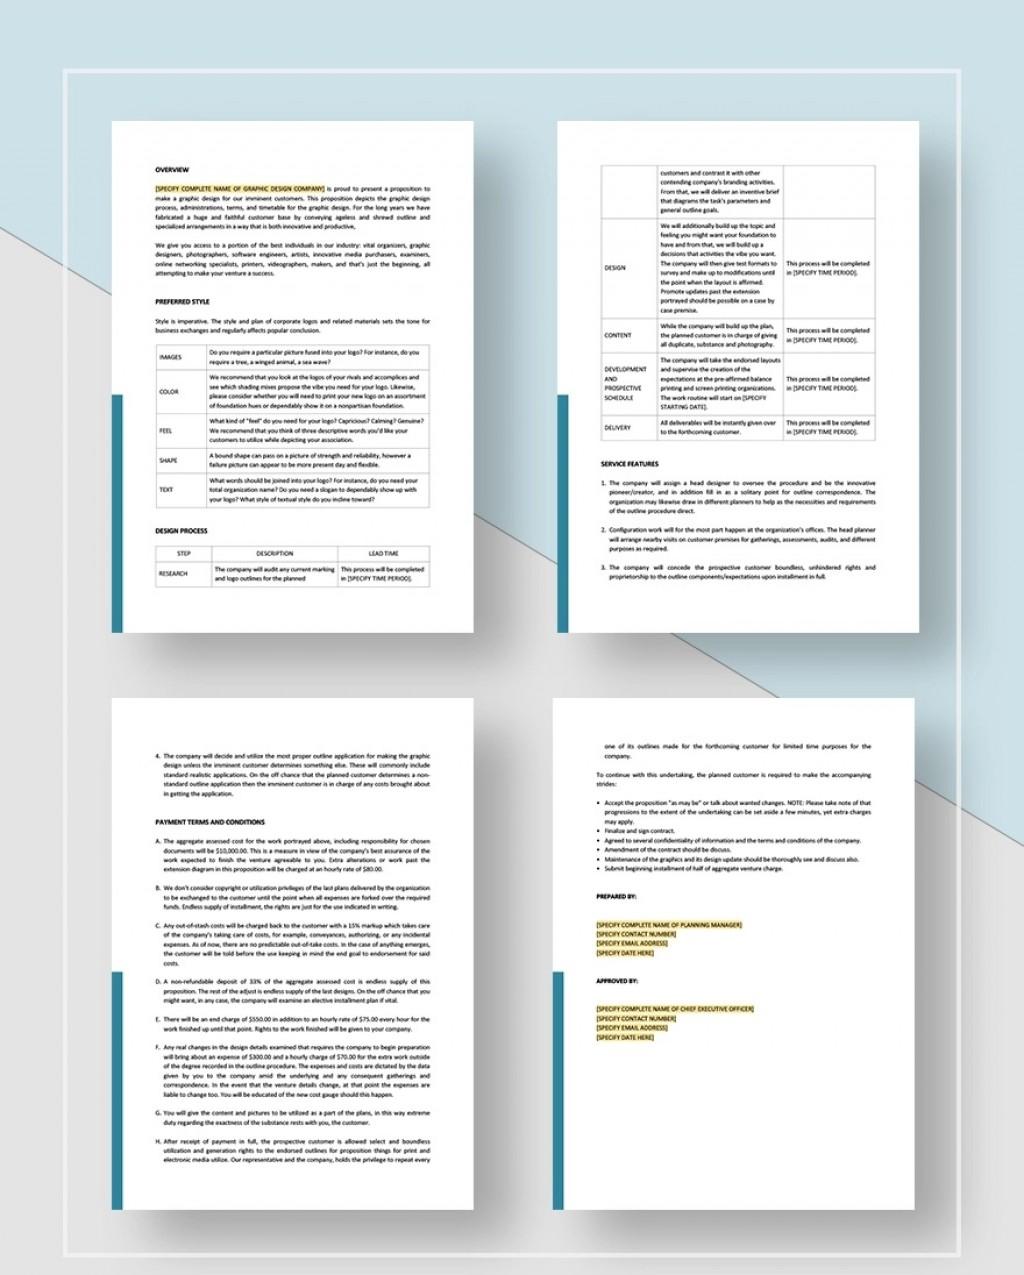 Graphic Design Proposal Template Sample Complete Jpg  Pdf Doc WordLarge